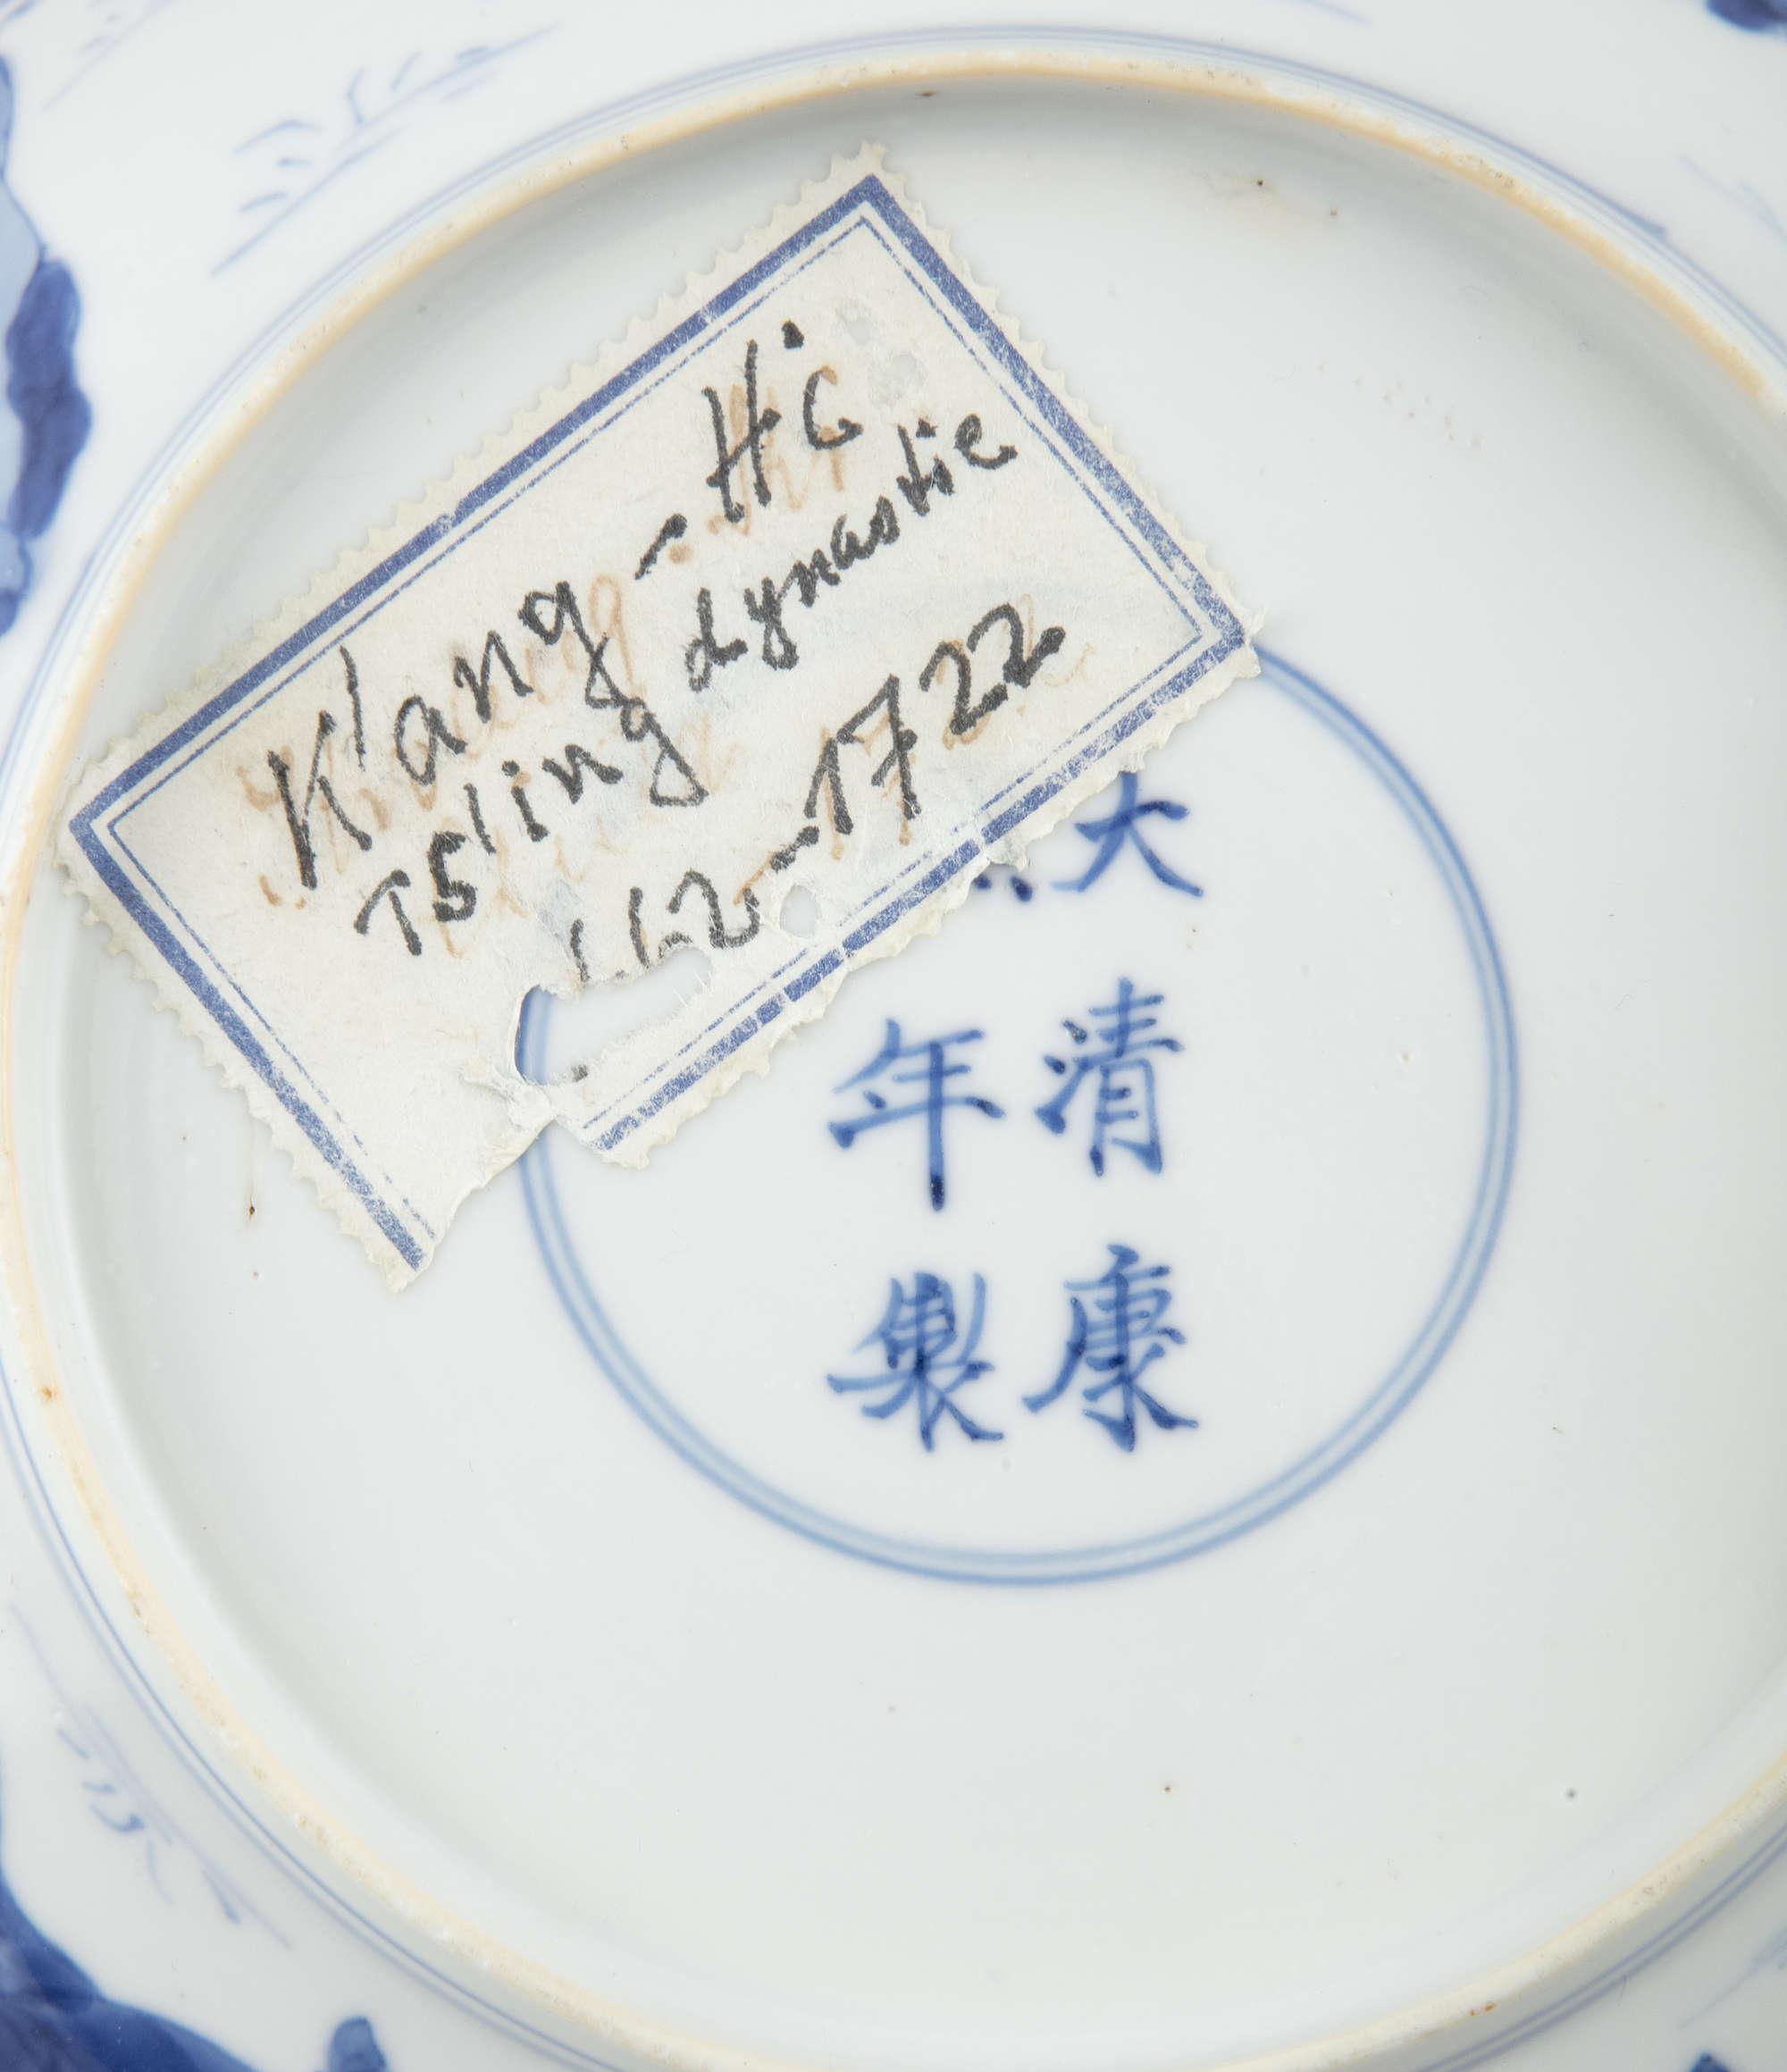 A BLUE AND WHITE 'EIGHT HORSES OF WANG MU' PORCELAIN DISH China, Qing Dynasty, Kangxi mark and - Image 6 of 17